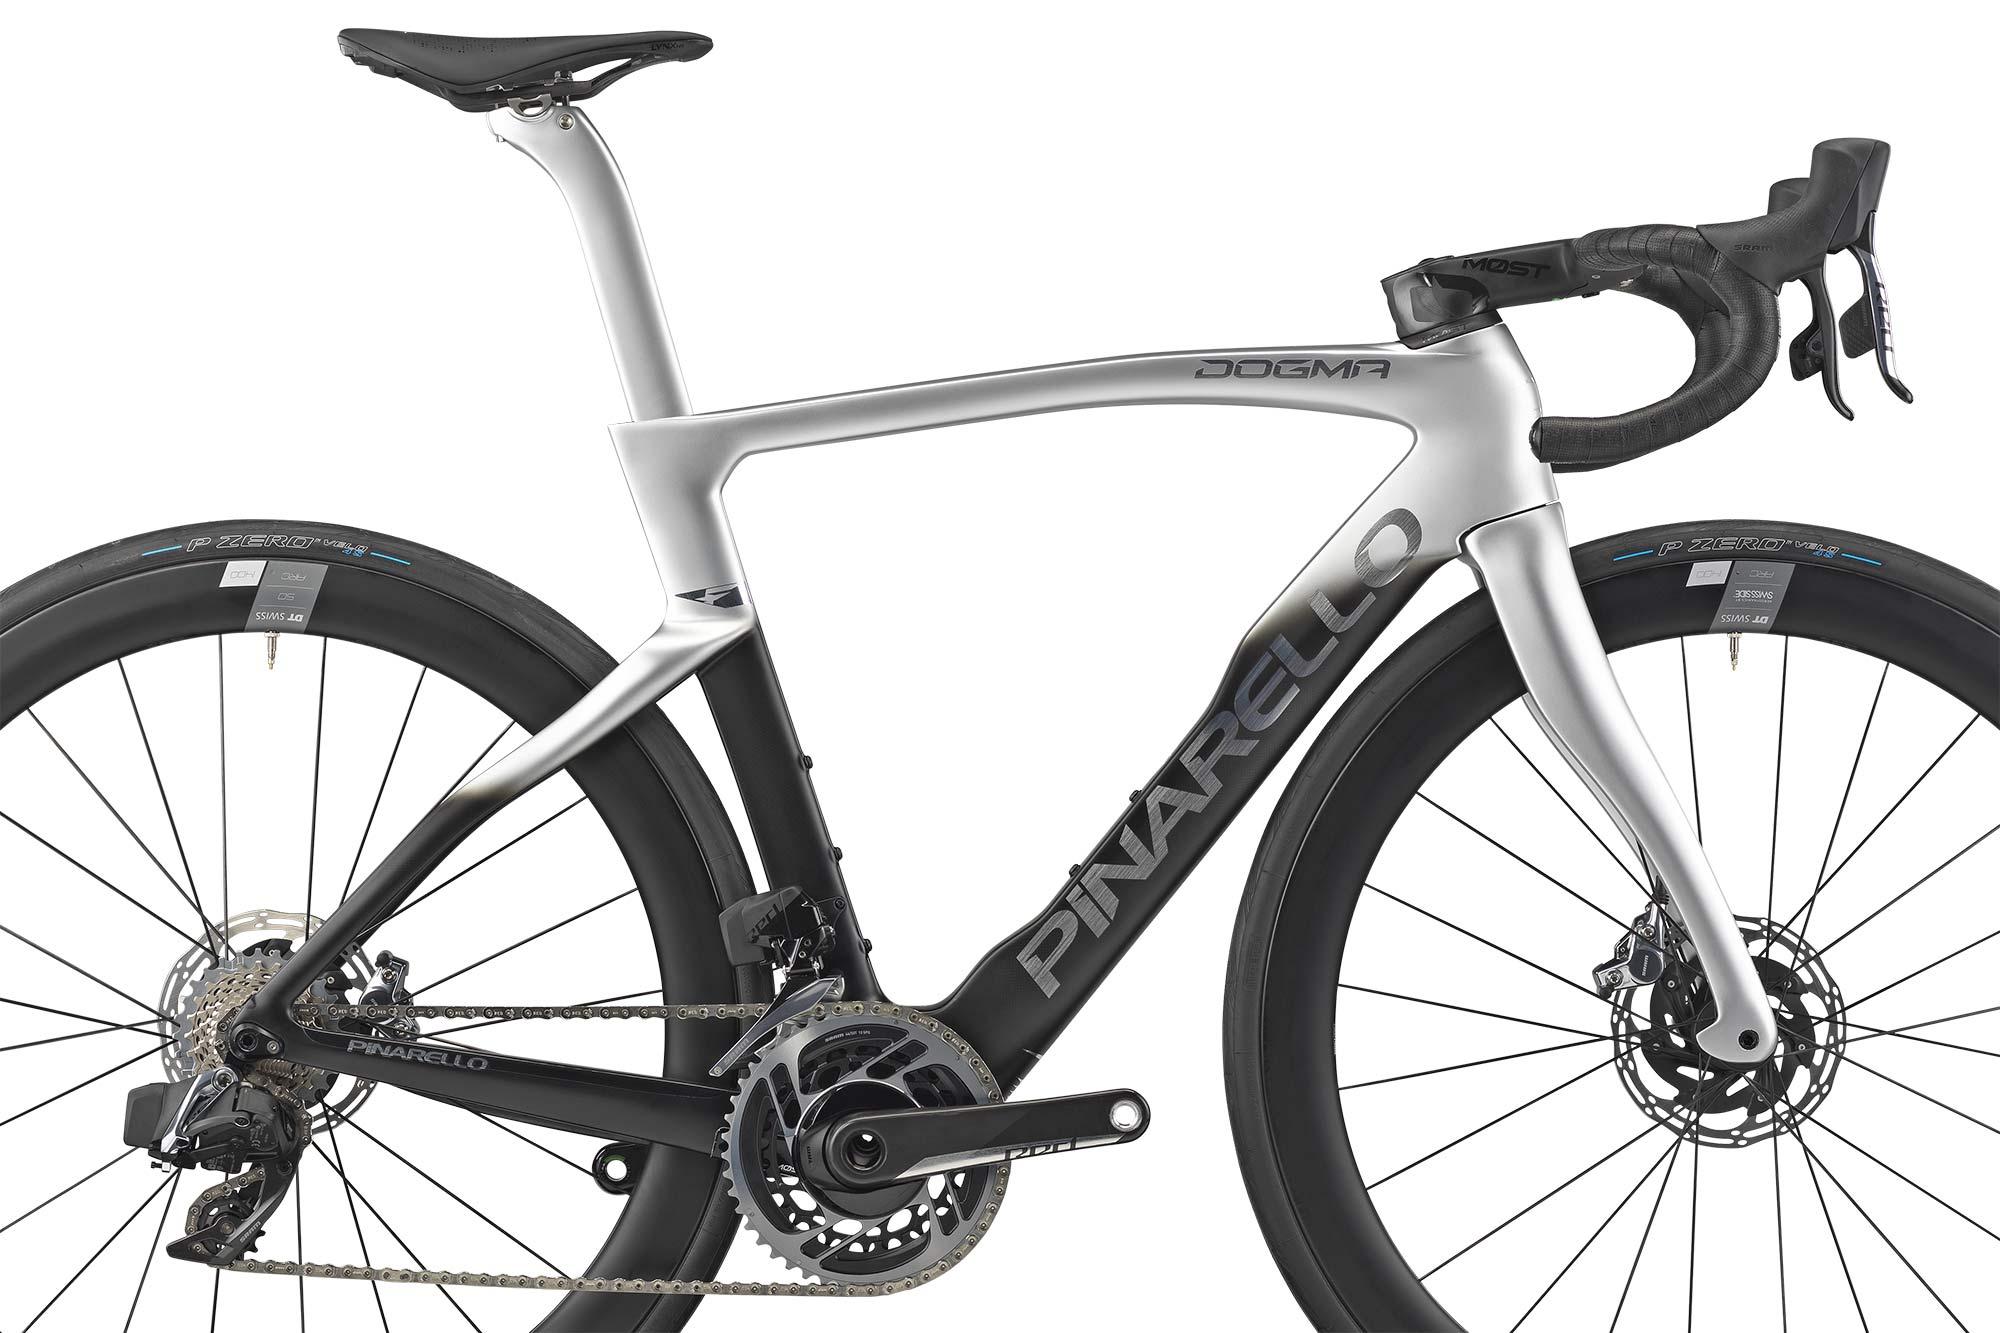 2022 Pinarello Dogma F curvy aero carbon road race bike, disc brake frameset